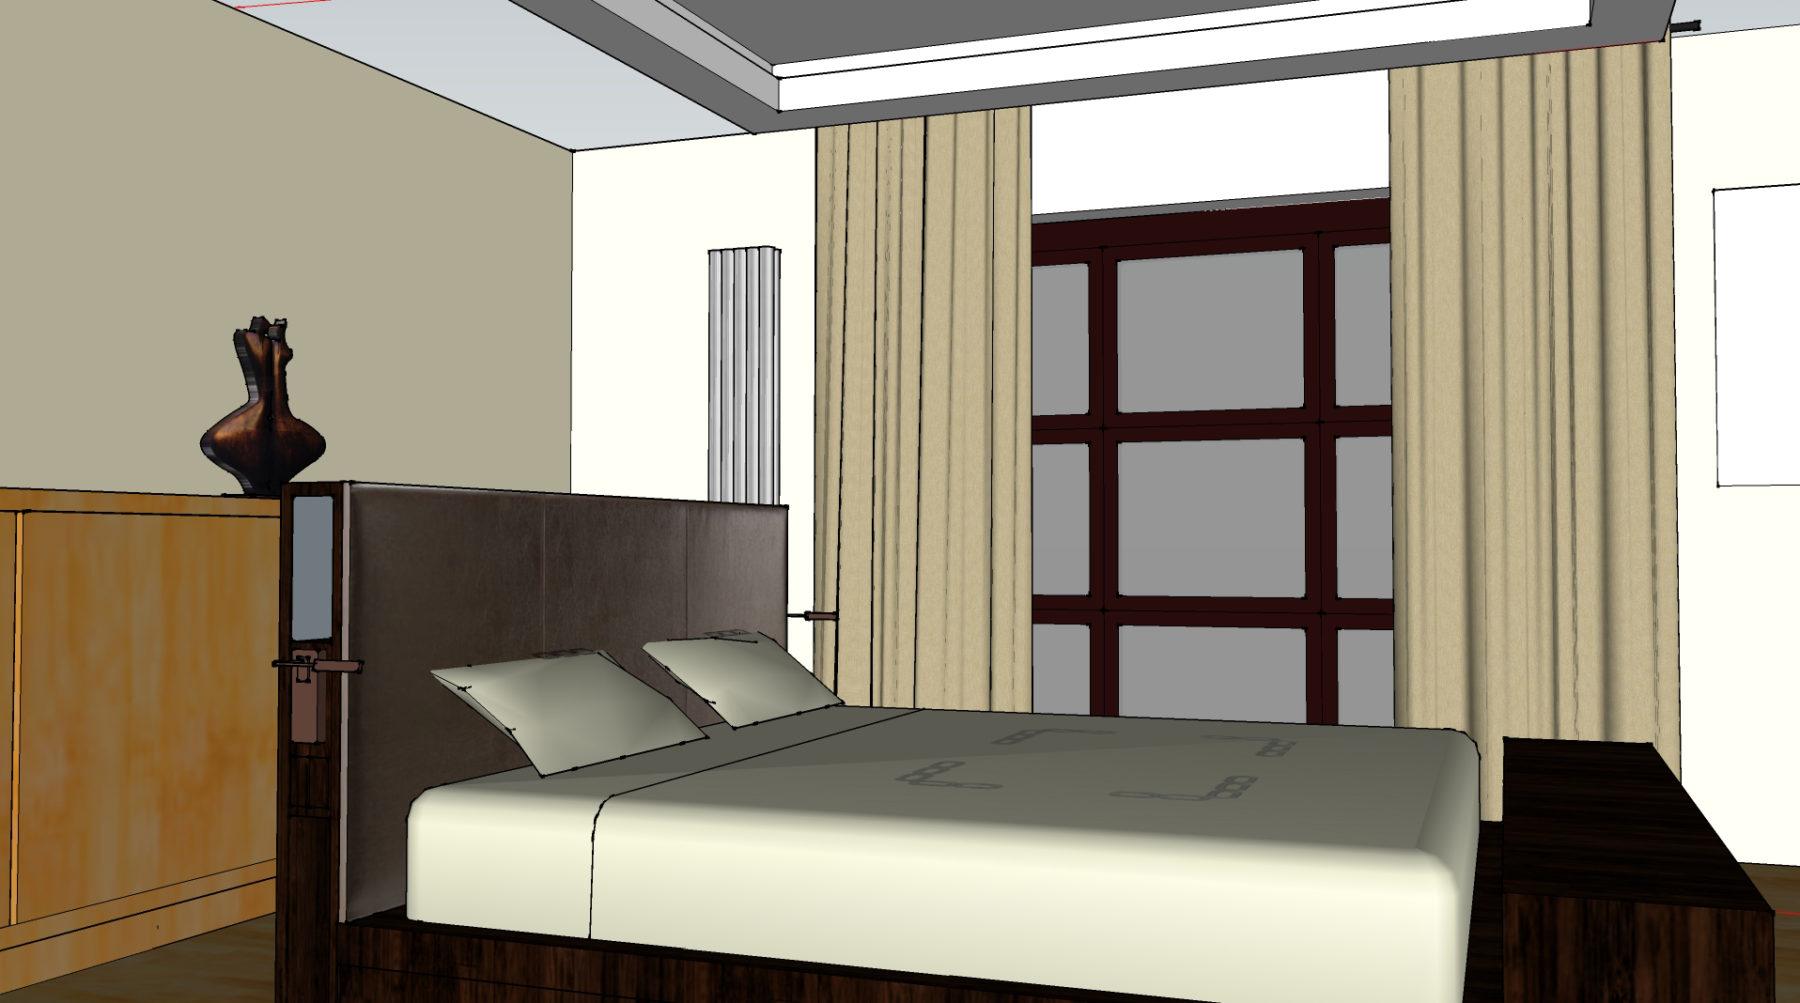 maison arlinea architecture. Black Bedroom Furniture Sets. Home Design Ideas